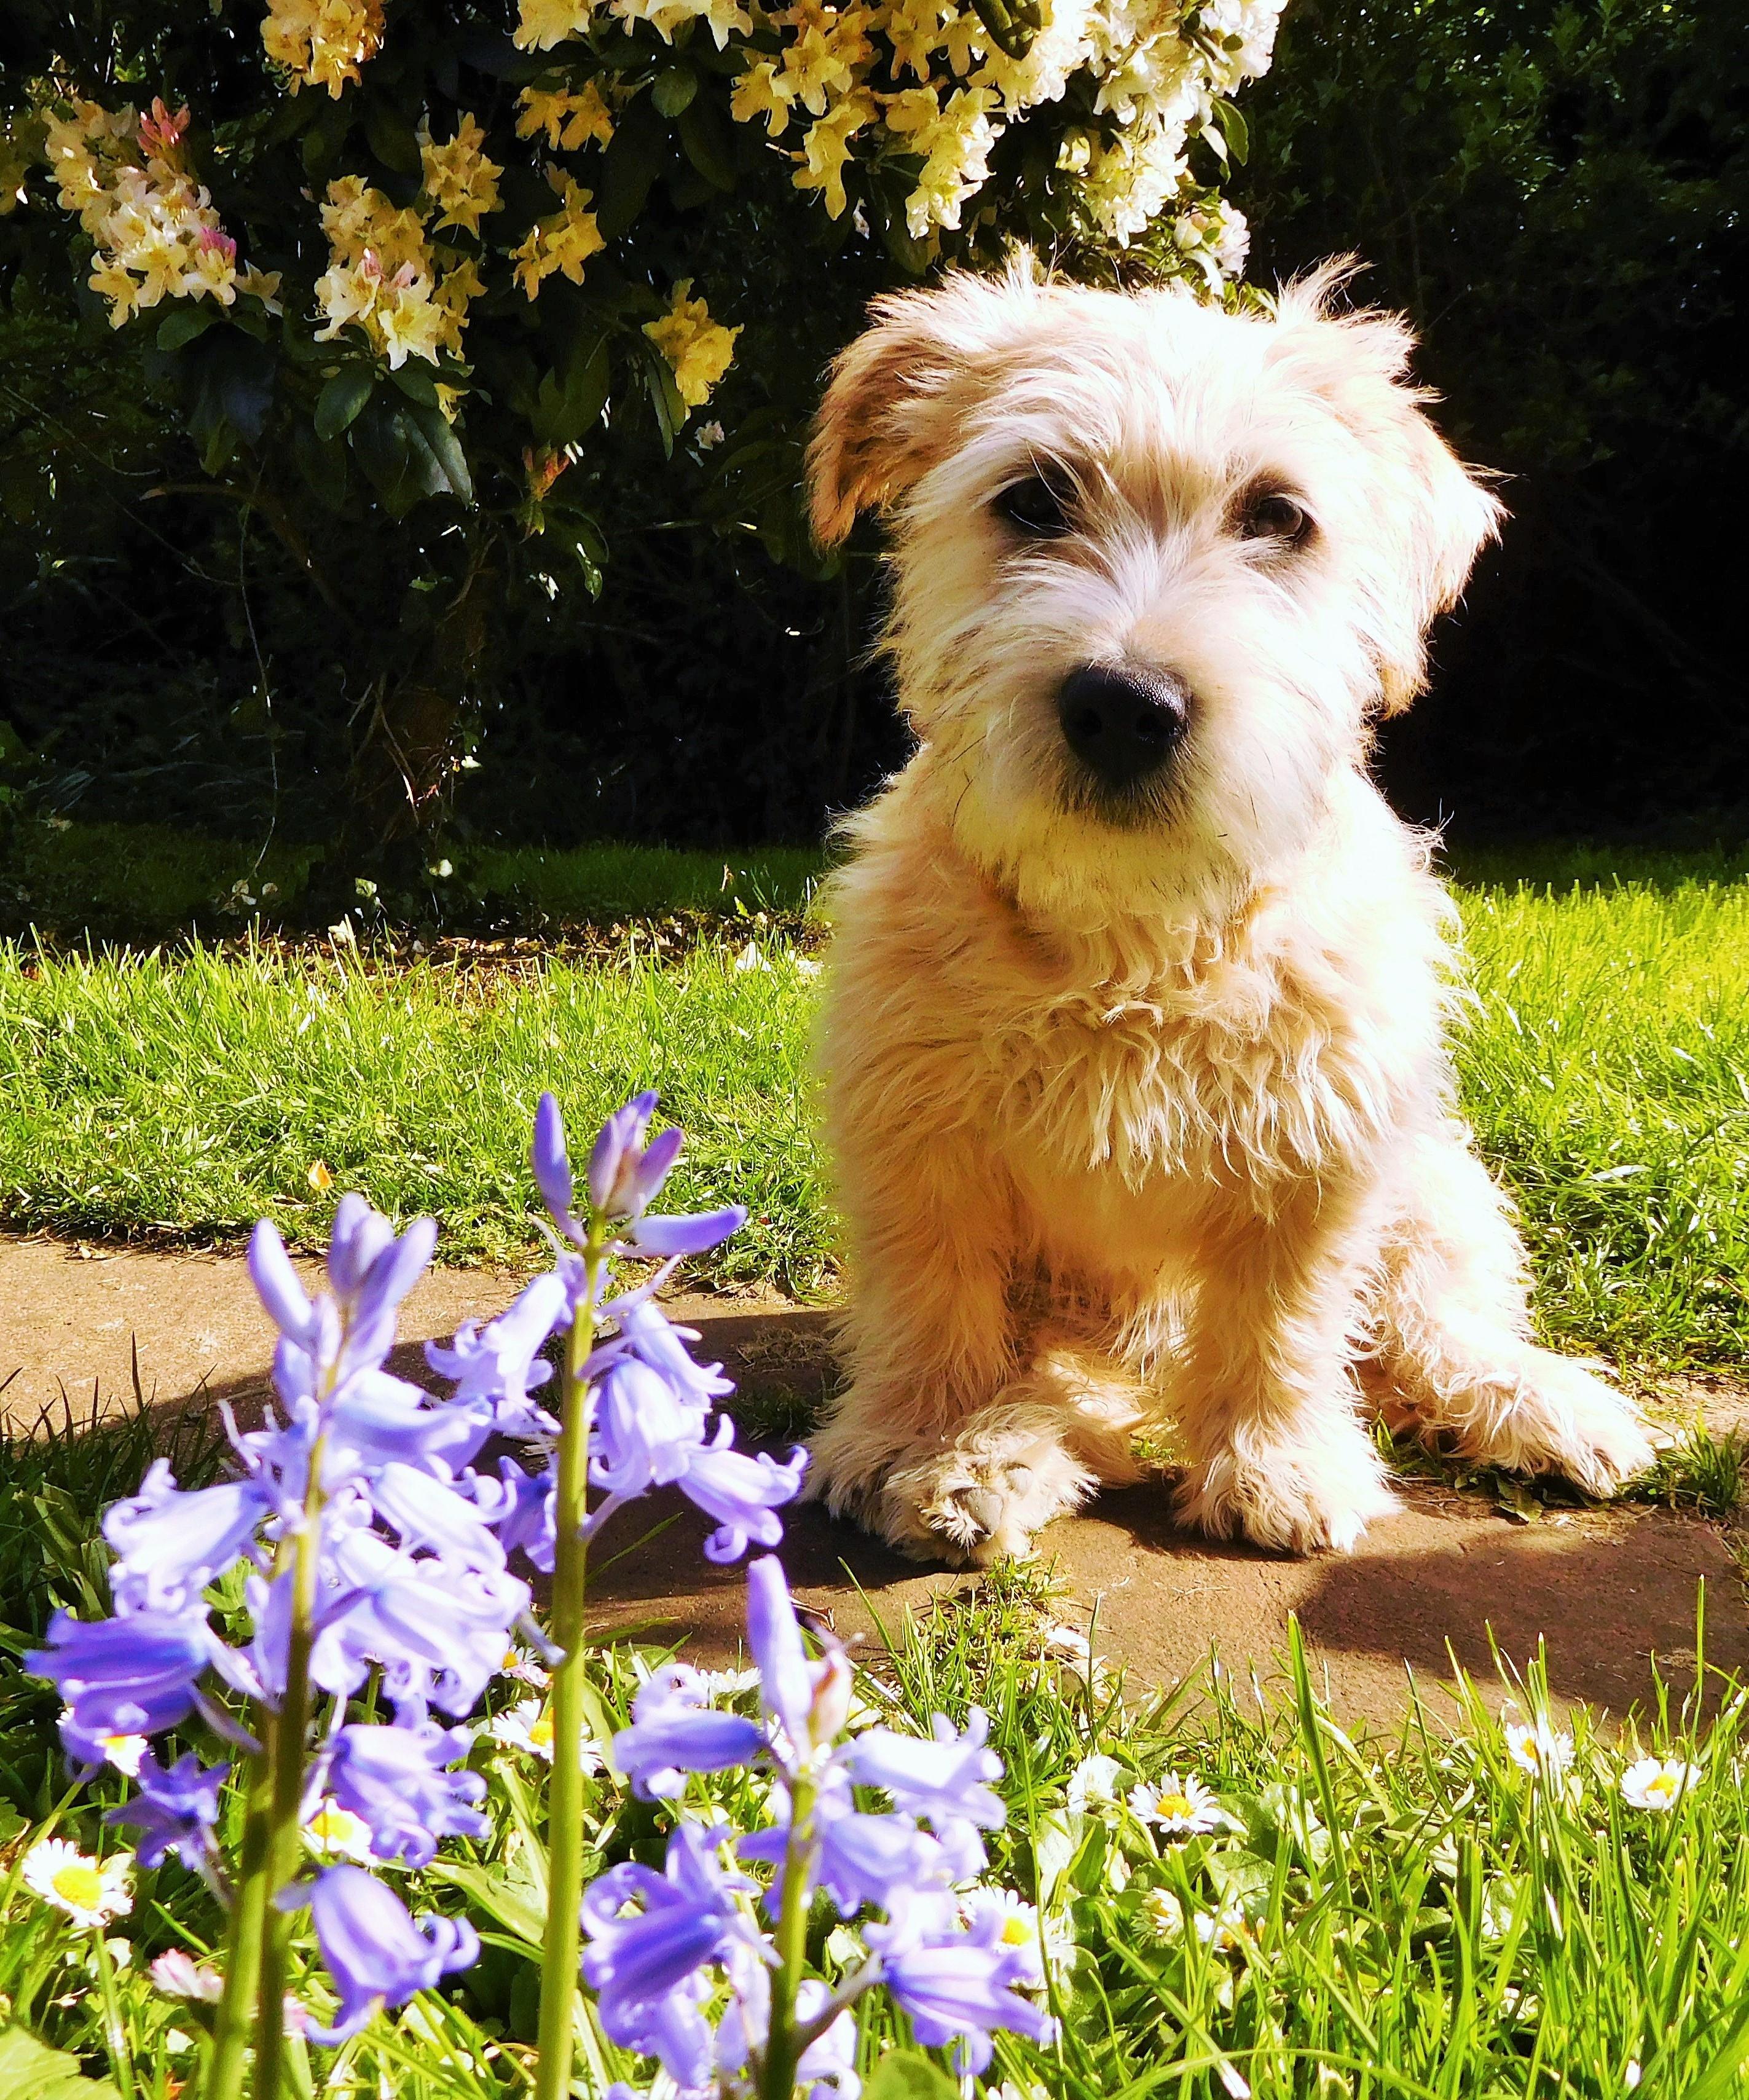 A NETTLE AMONG FLOWERS